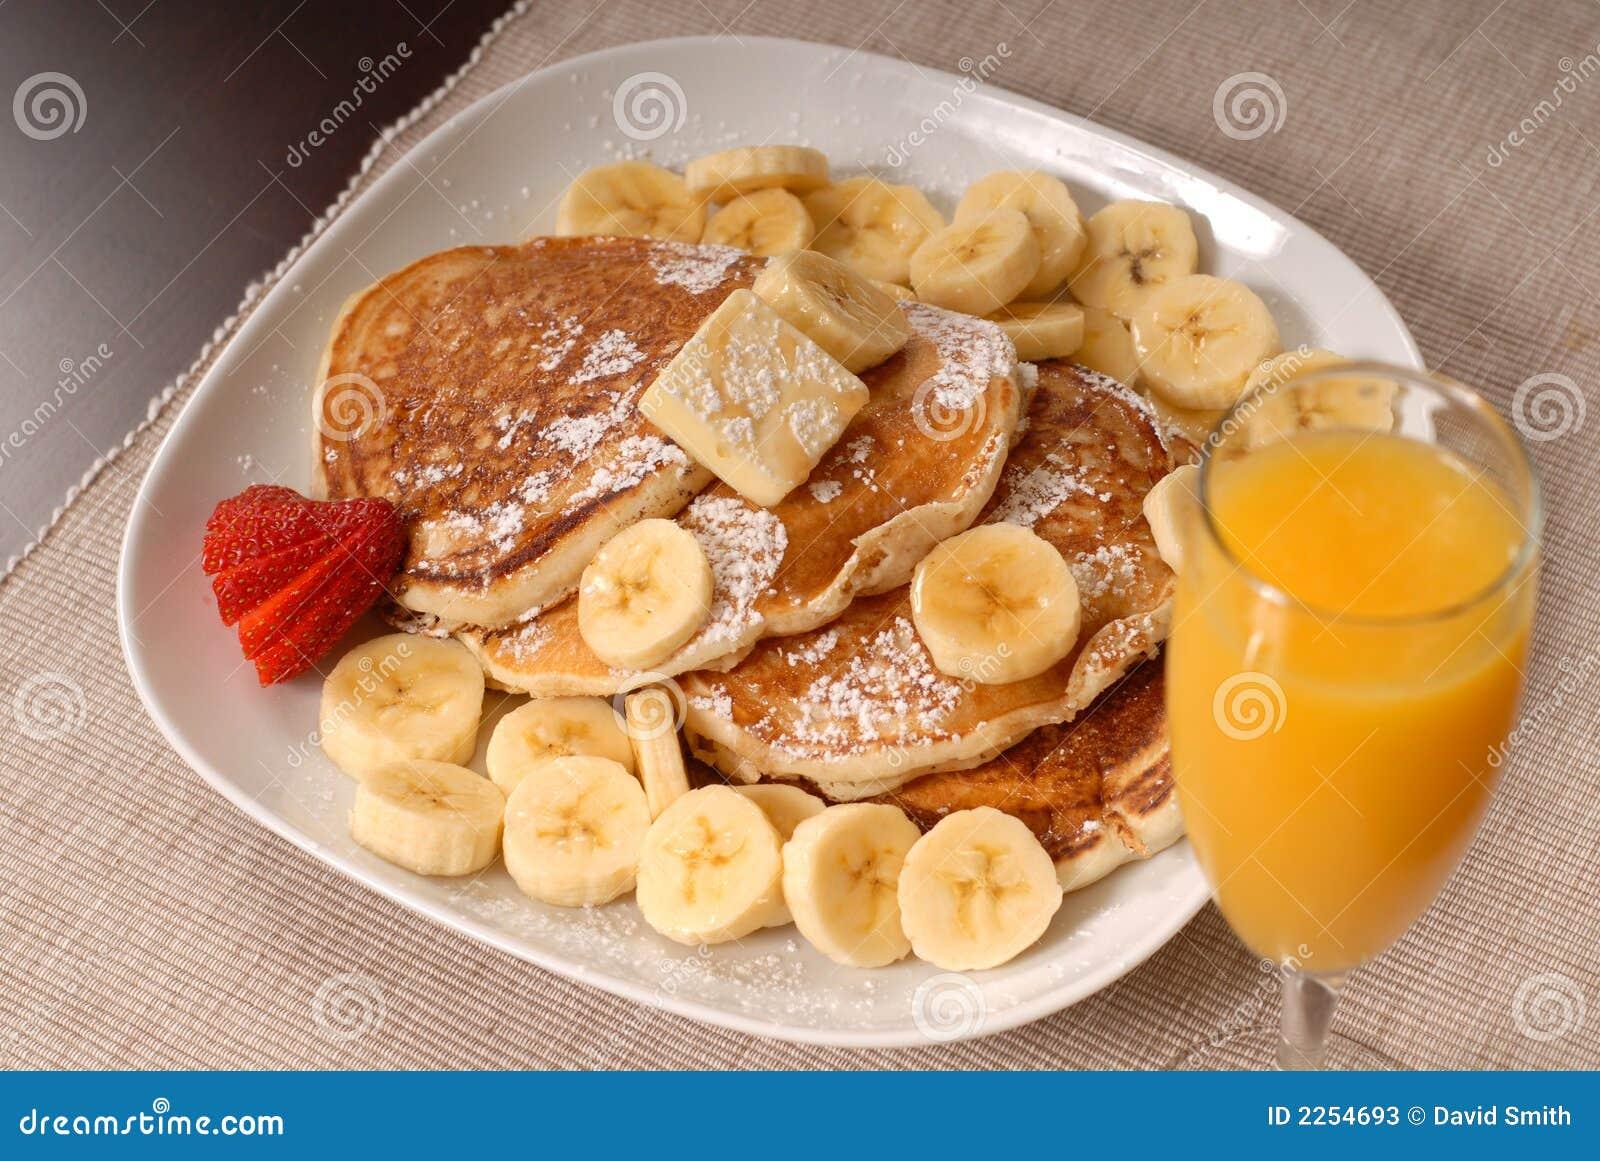 Download Banana pancakes with juice stock image. Image of pancakes - 2254693